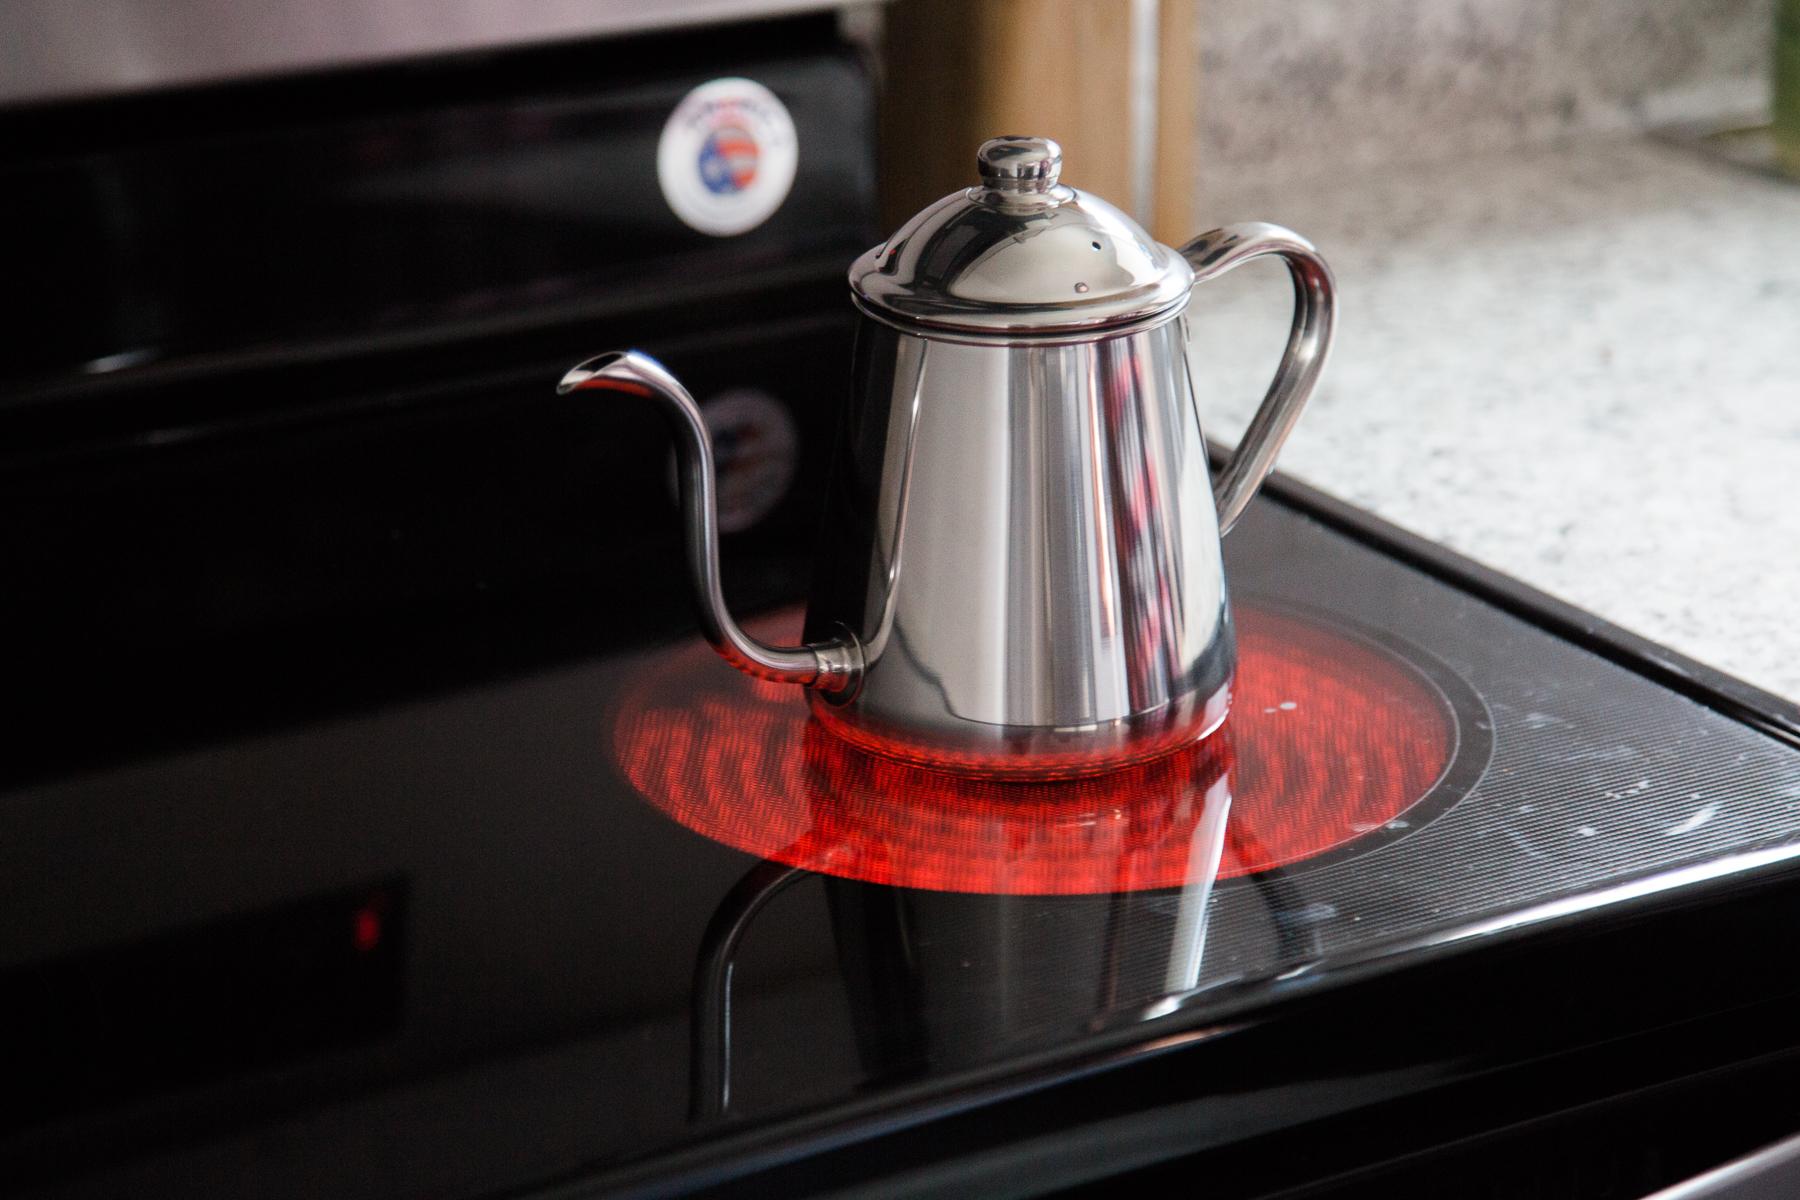 Takahiro Pouring kettles